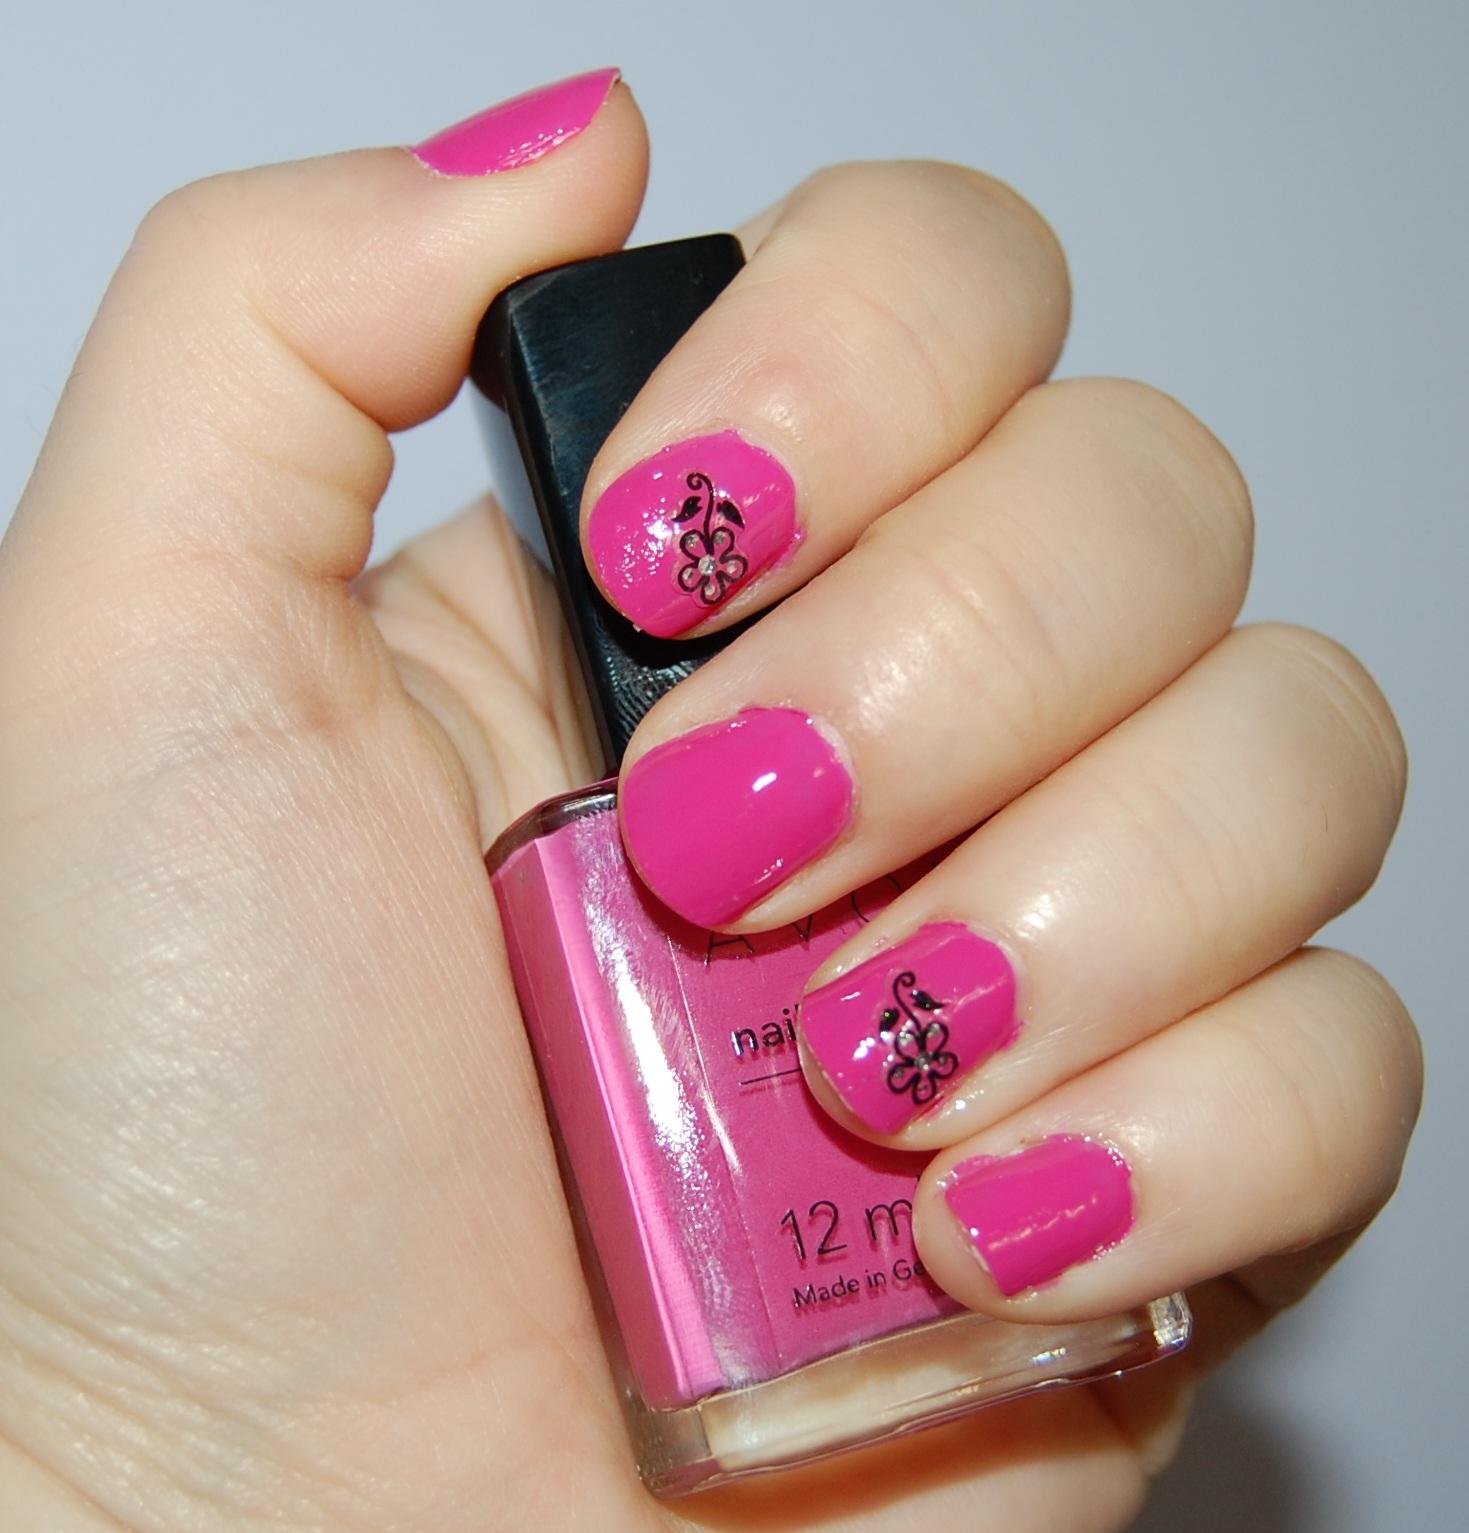 Gabrielle Colorful Beauty: NOTD: Avon Nailwear Pro Viva Pink